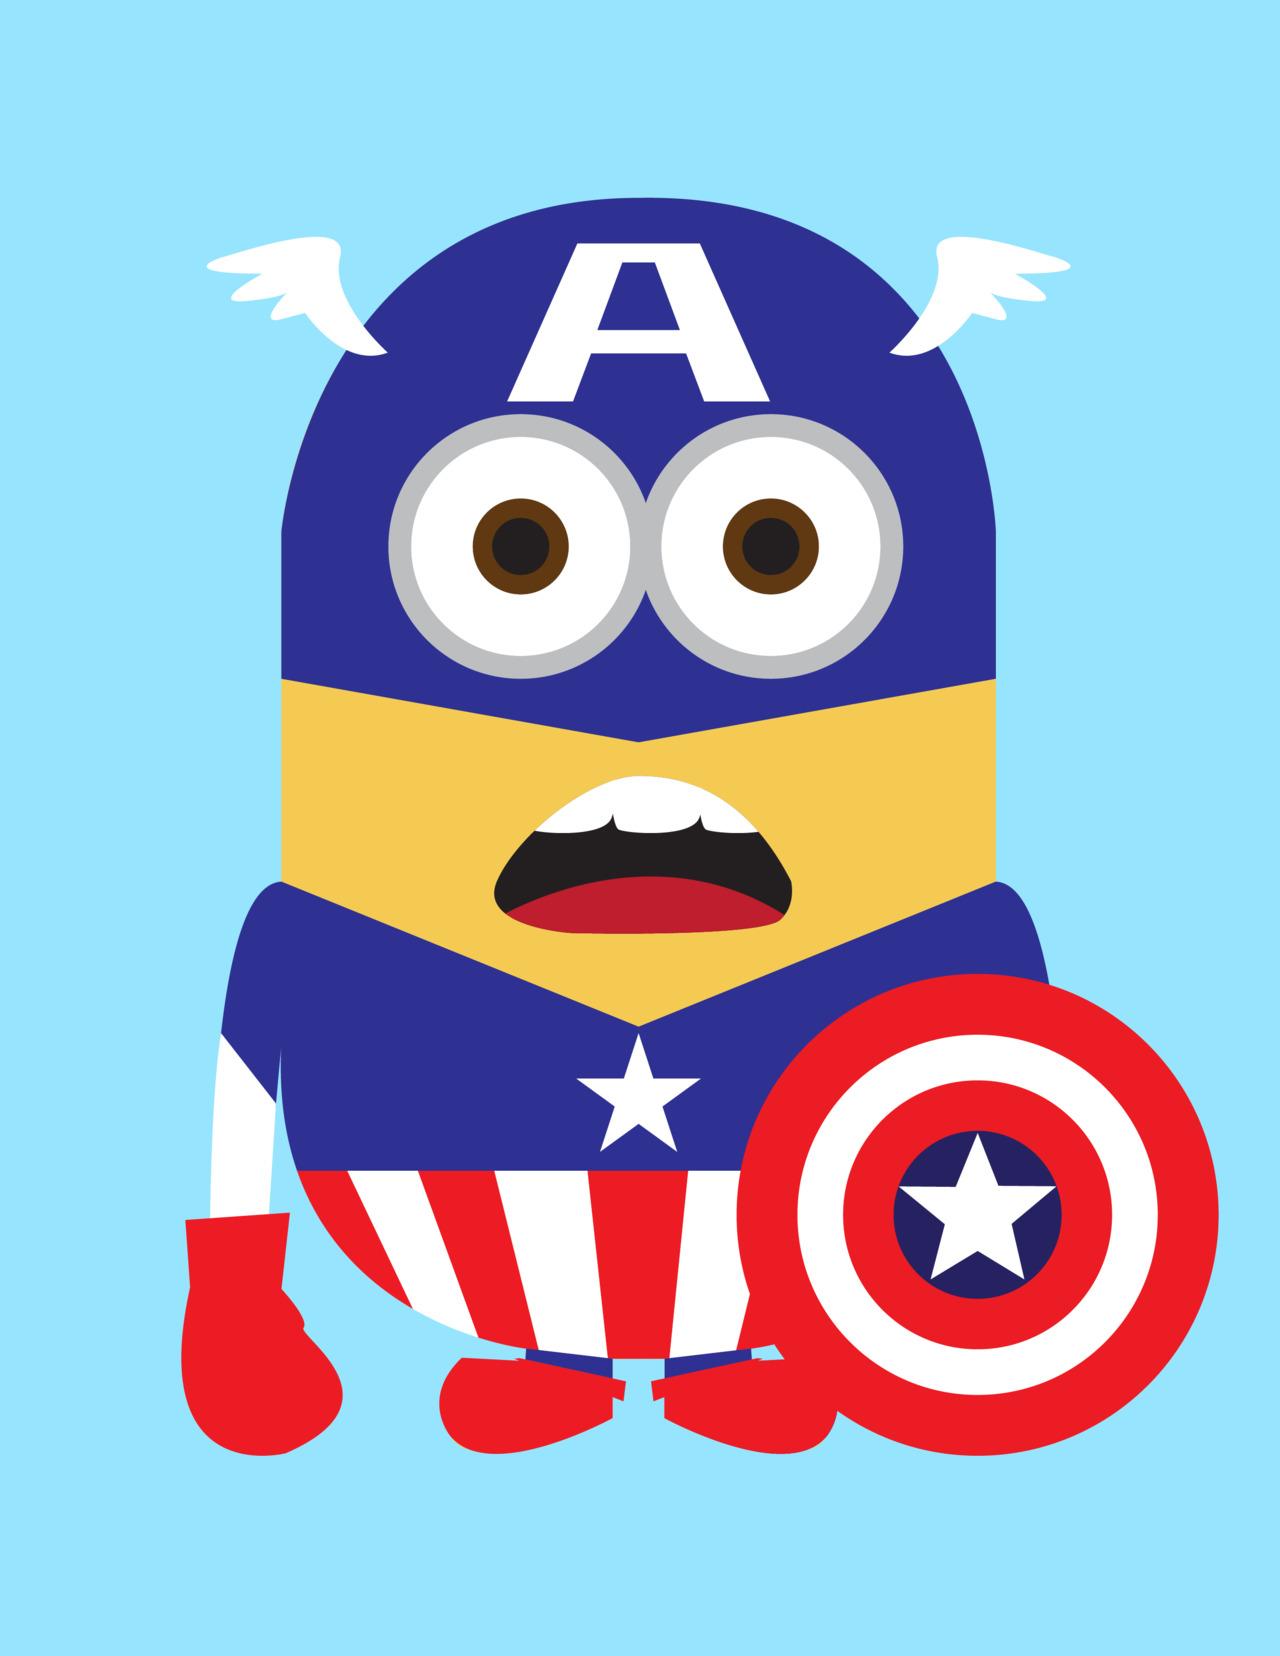 Minion Captain America Amigurumi : Despicable Me 2 Minions as Adorable Superheroes